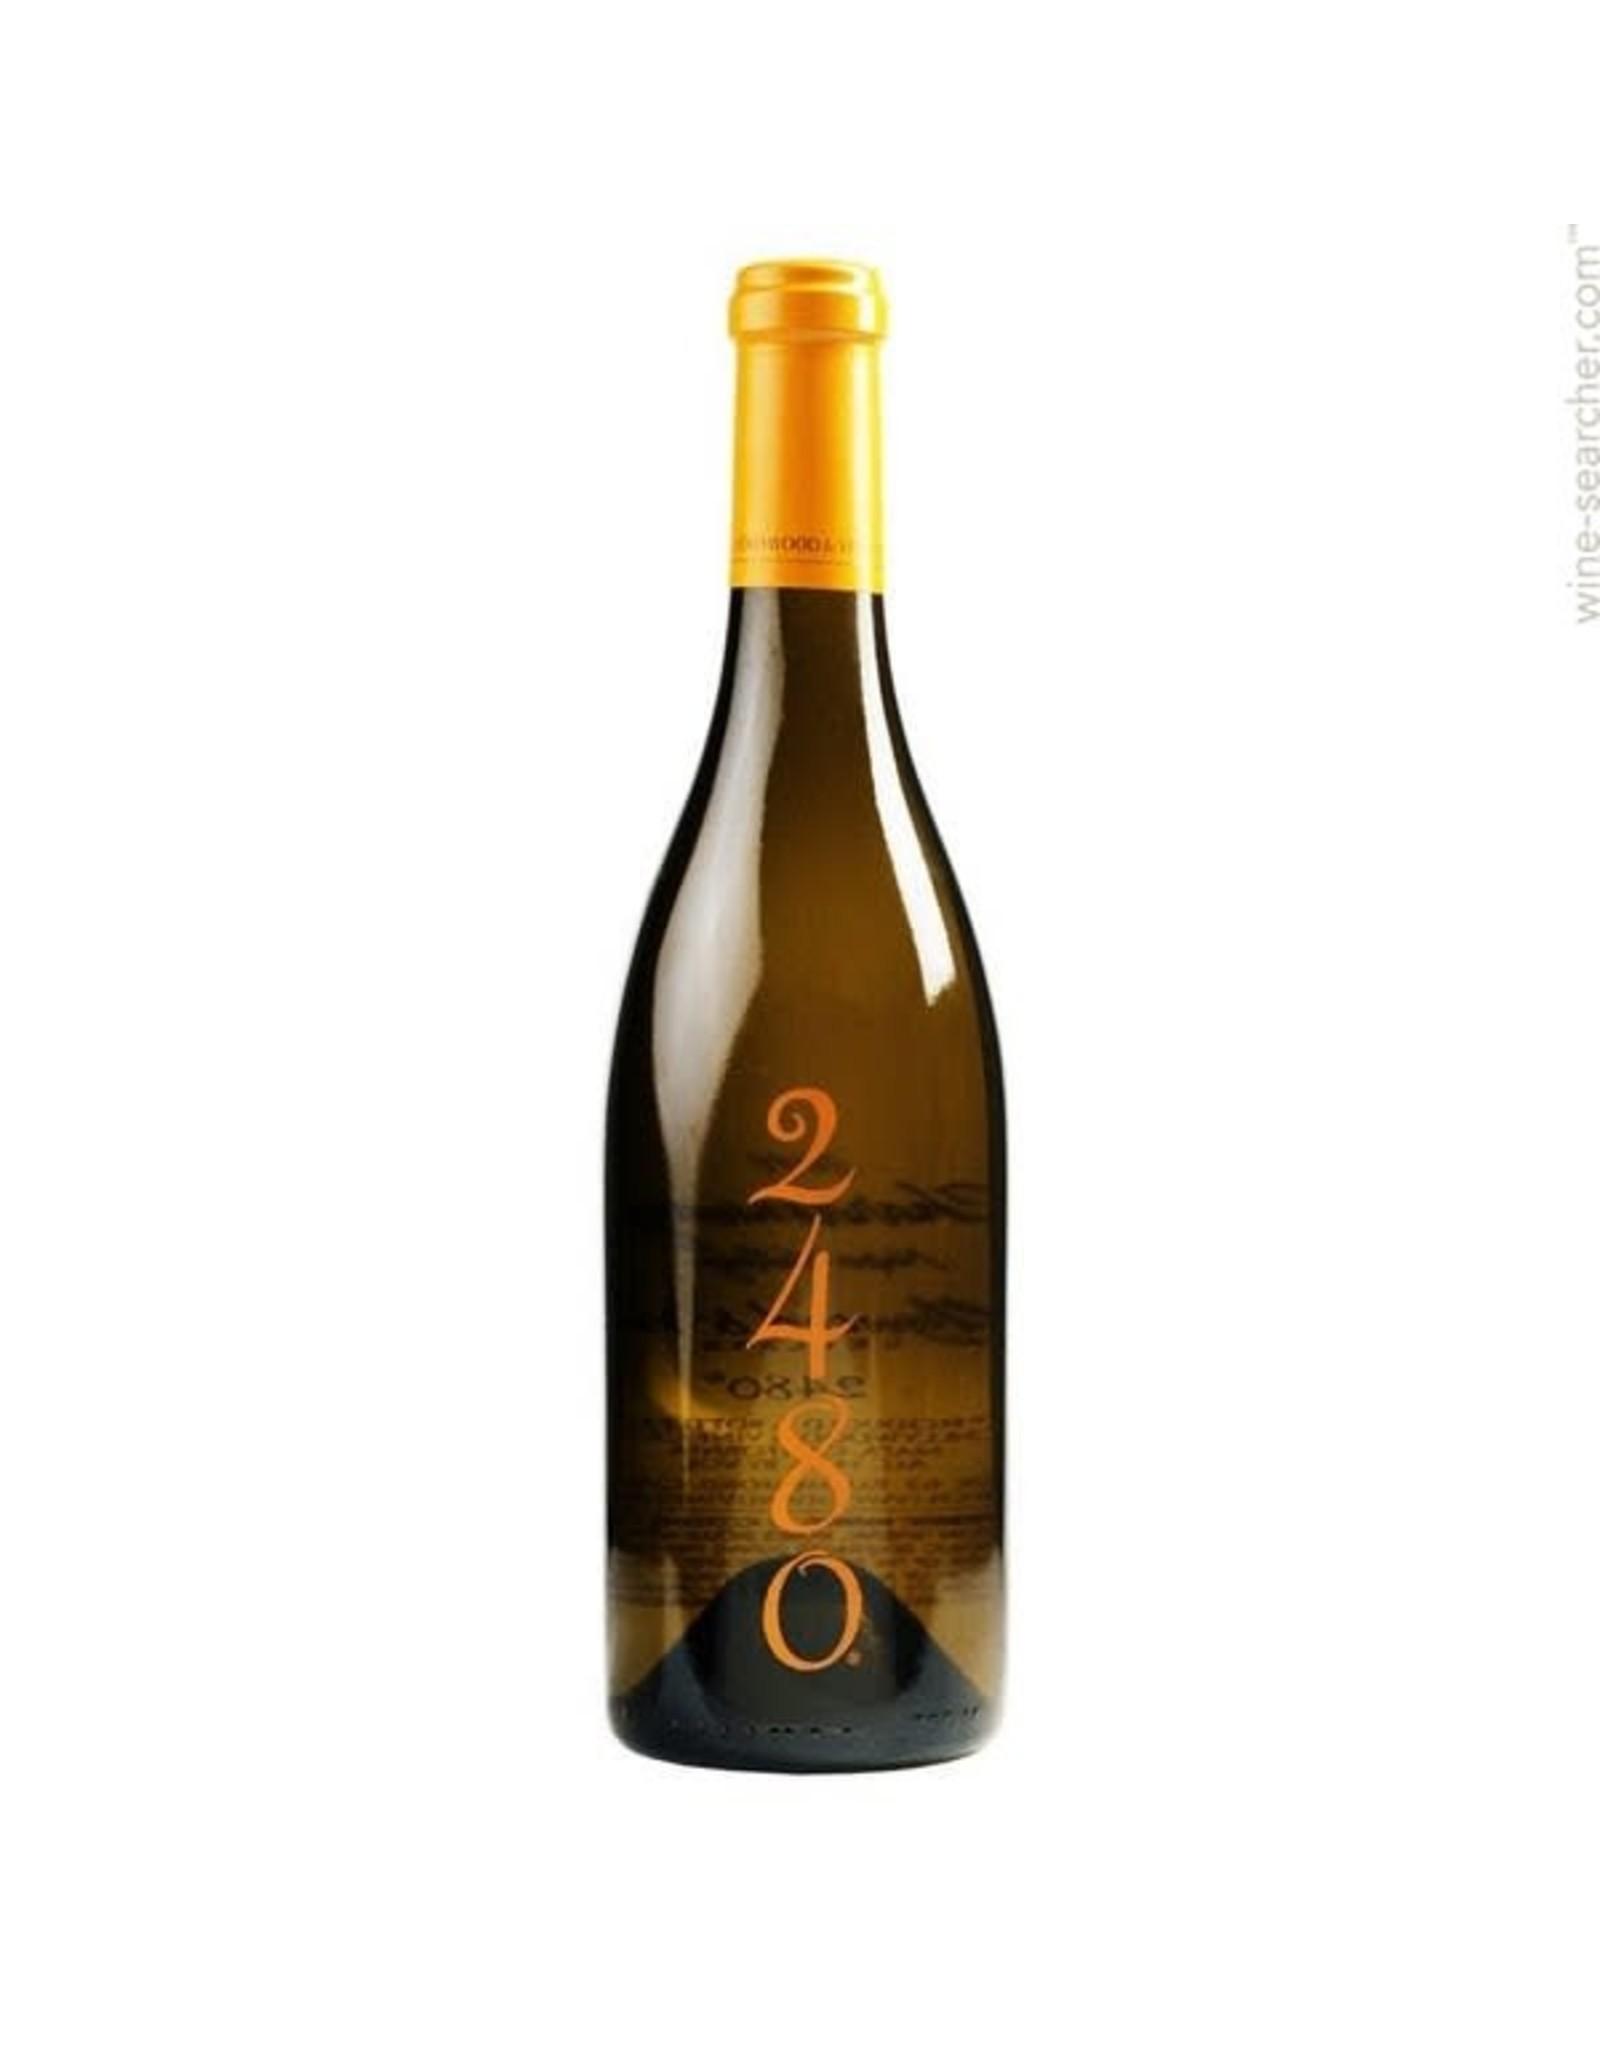 Hollywood & Vine 2480 Chardonnay 2015